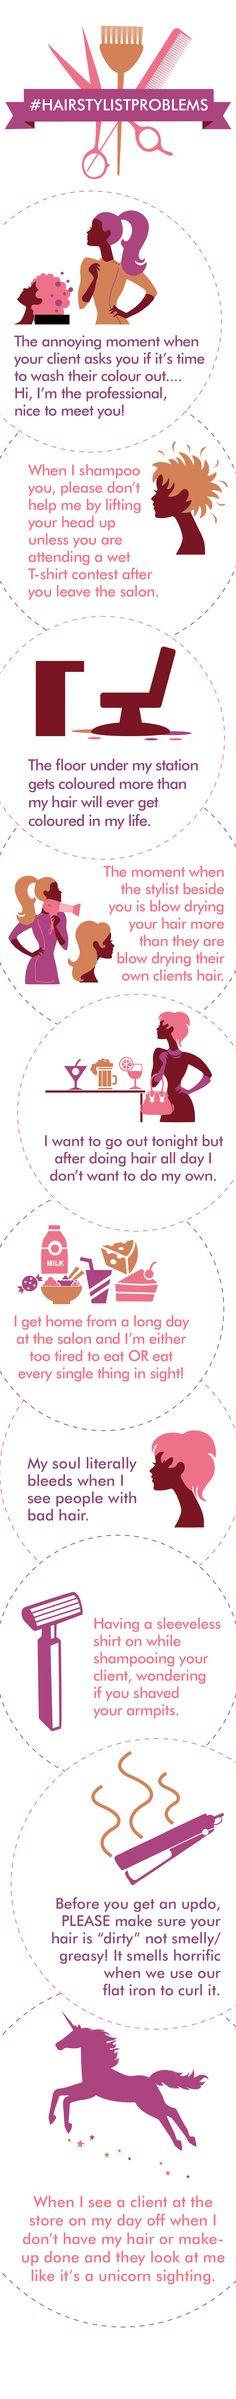 #HairstylistProblems | Hairsytlist | hairdresser | salon problems | hair | hair humor